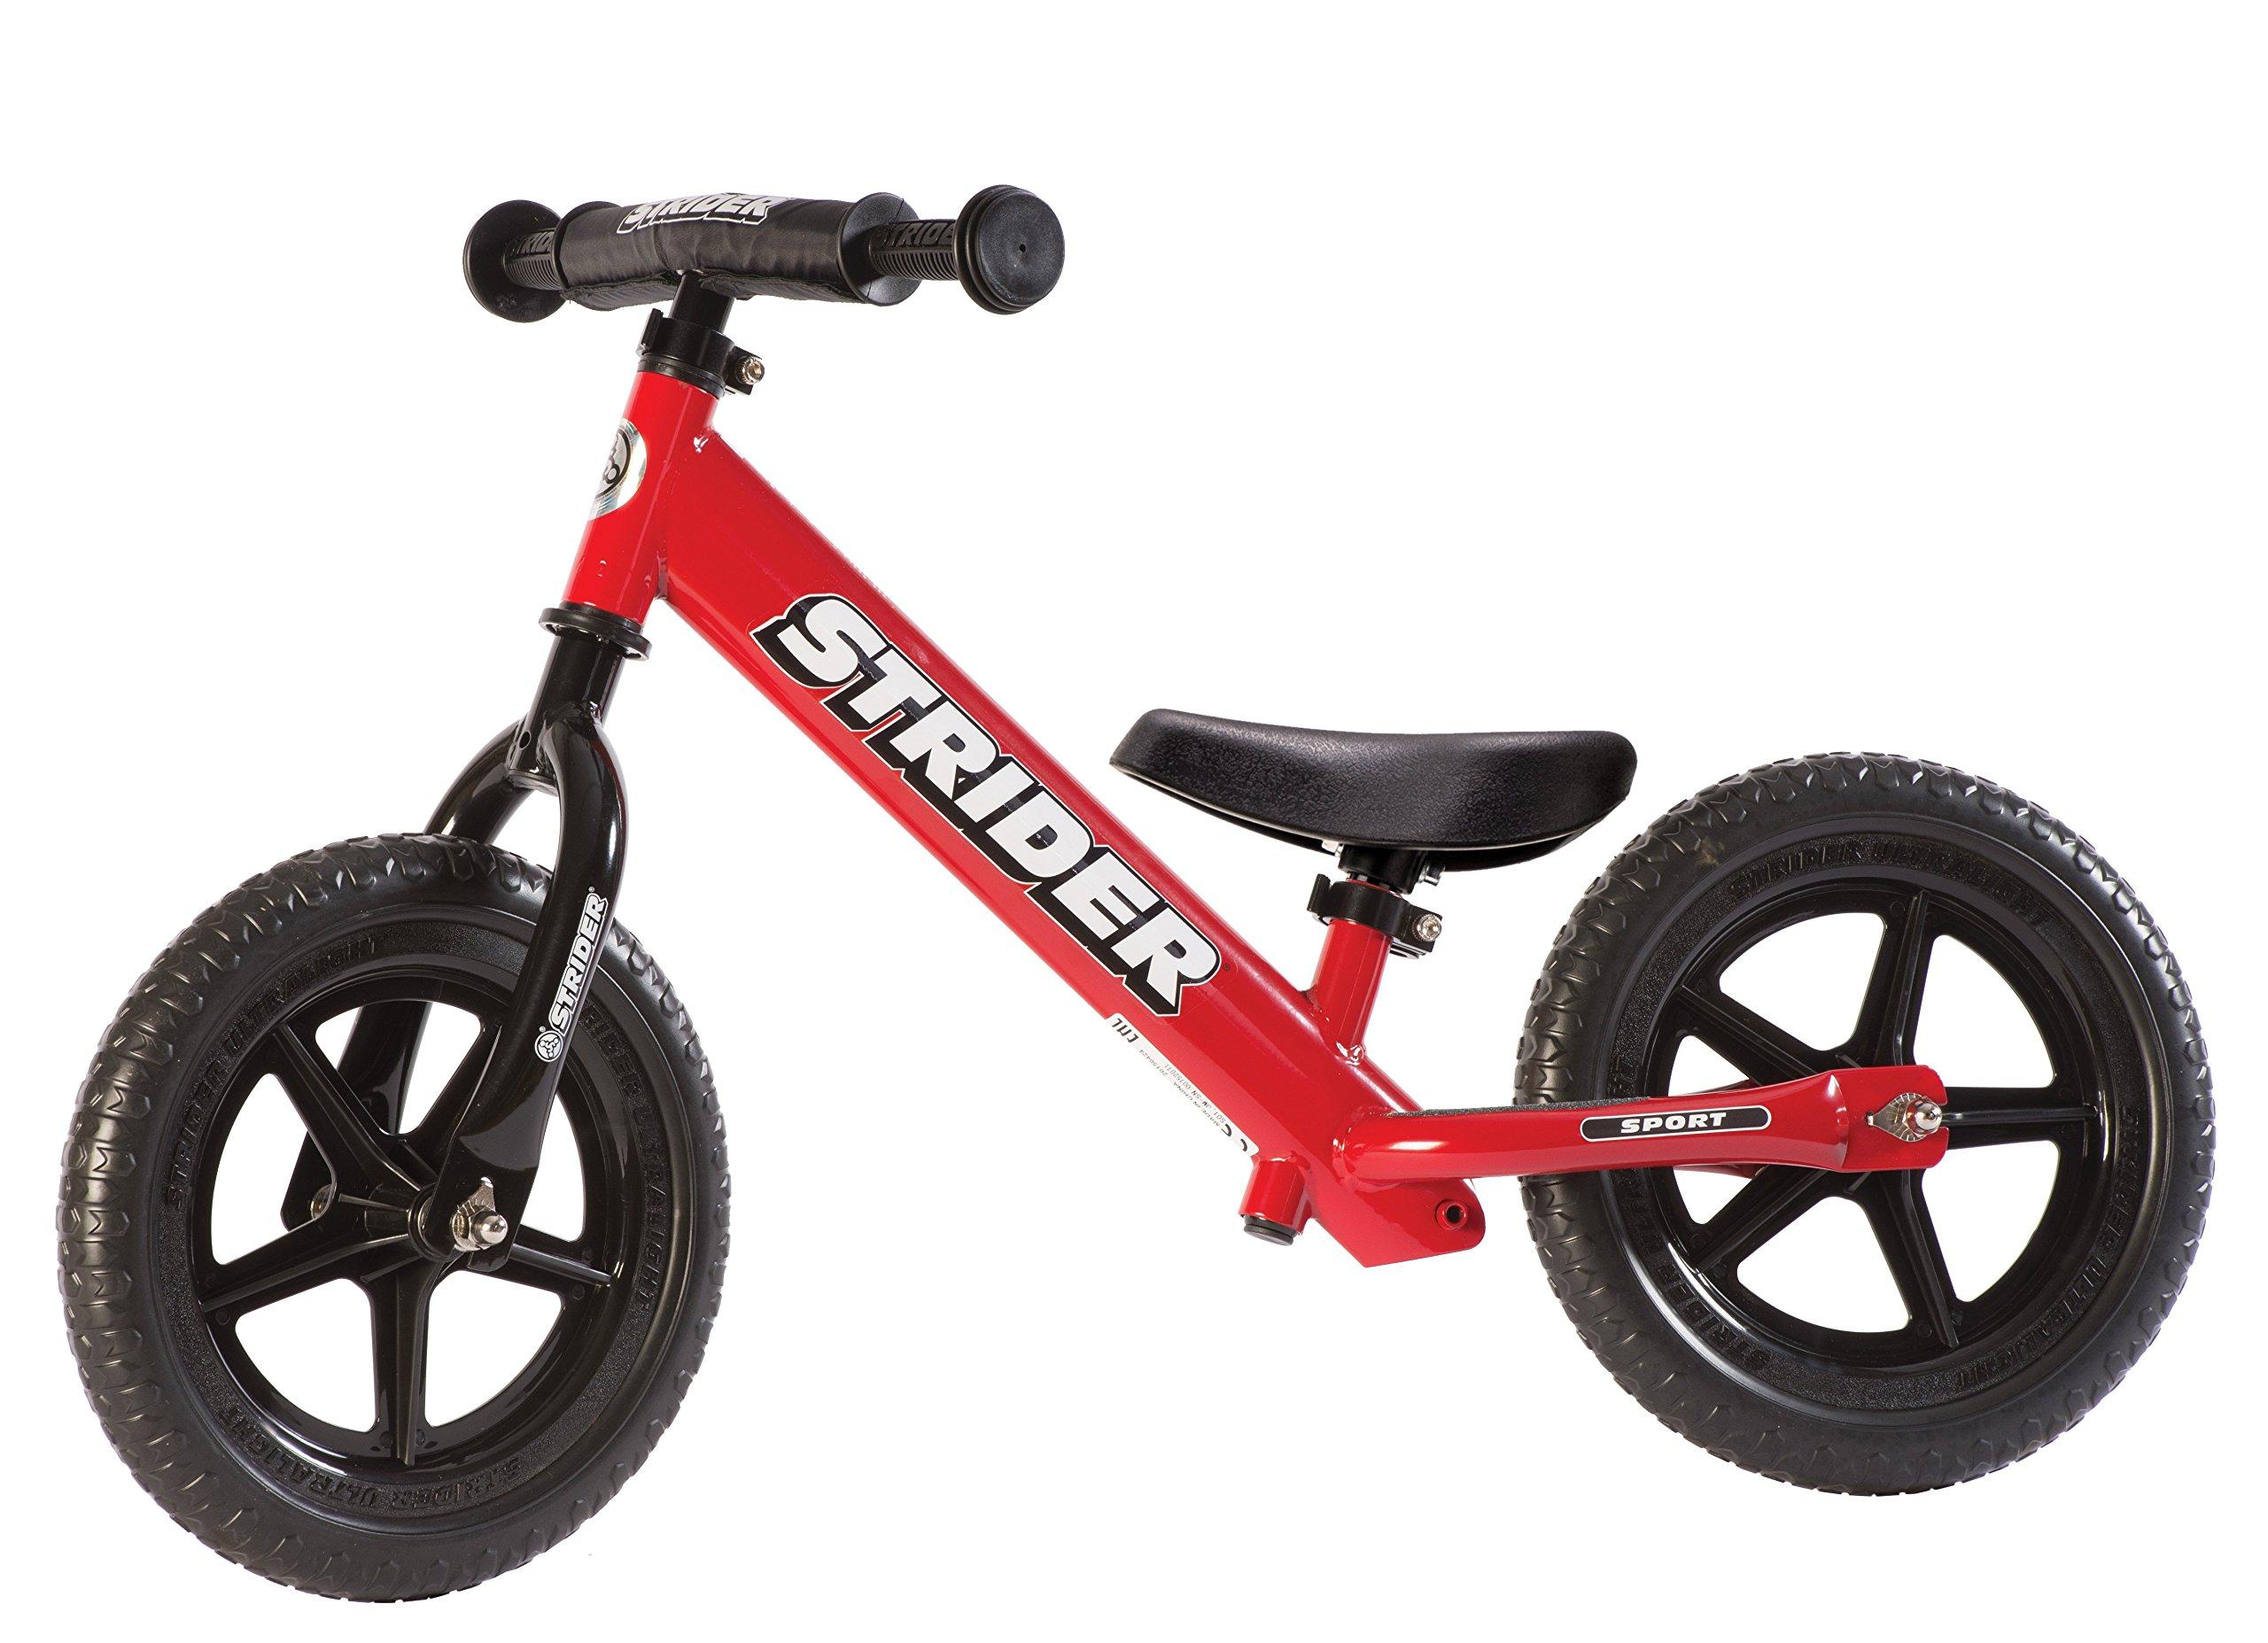 Strider - 12 Sport Balance Bike, Ages 18 Months to 5 Years, Red by Strider